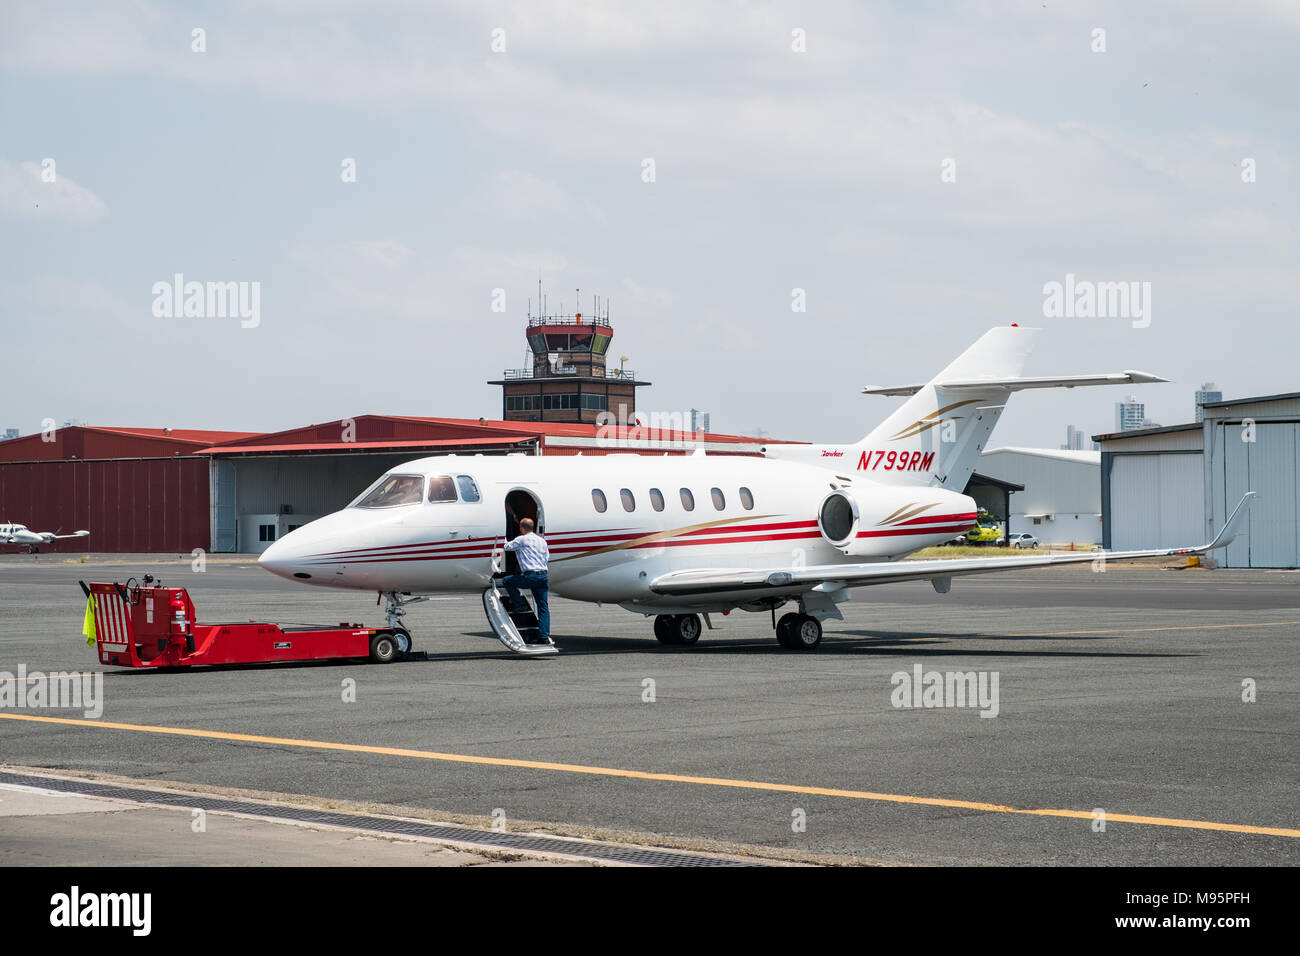 Panama City, Panama - March 2018: Private Jet, Raytheon Hawker 800XP at  Panama City Albrook Airport - Stock Image